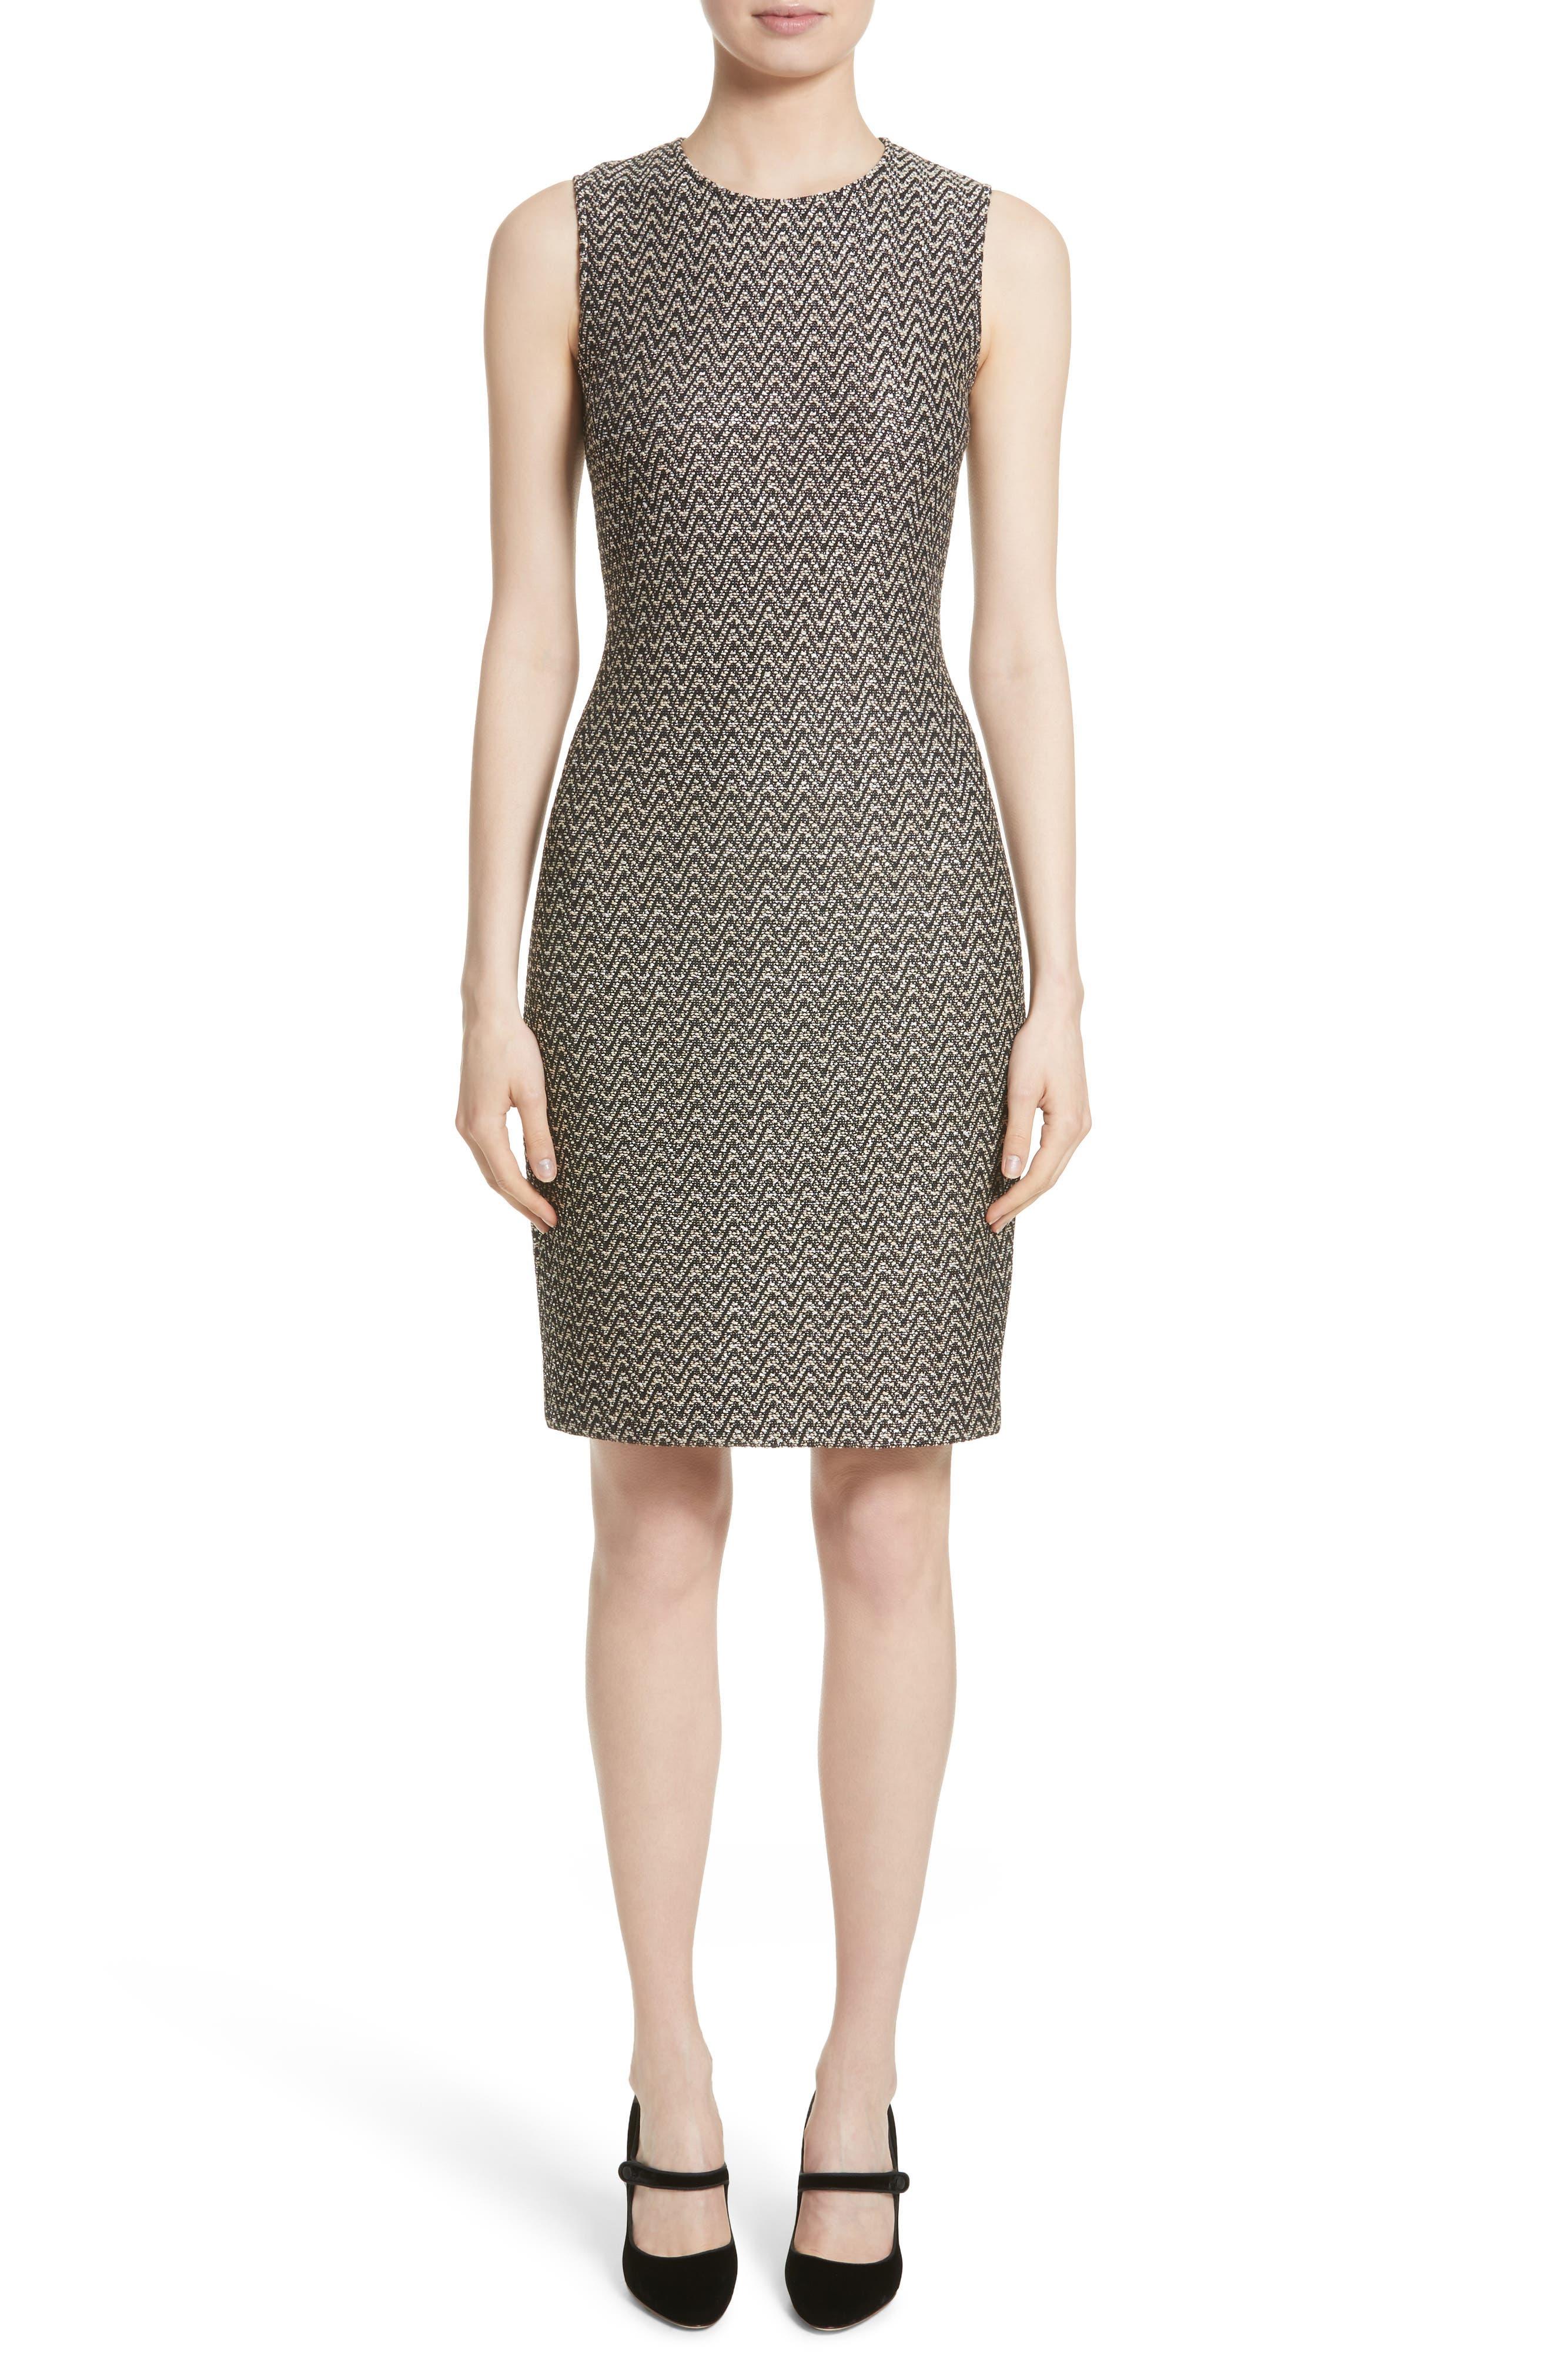 ST. JOHN COLLECTION Aluna Speckled Chevron Tweed Knit Dress